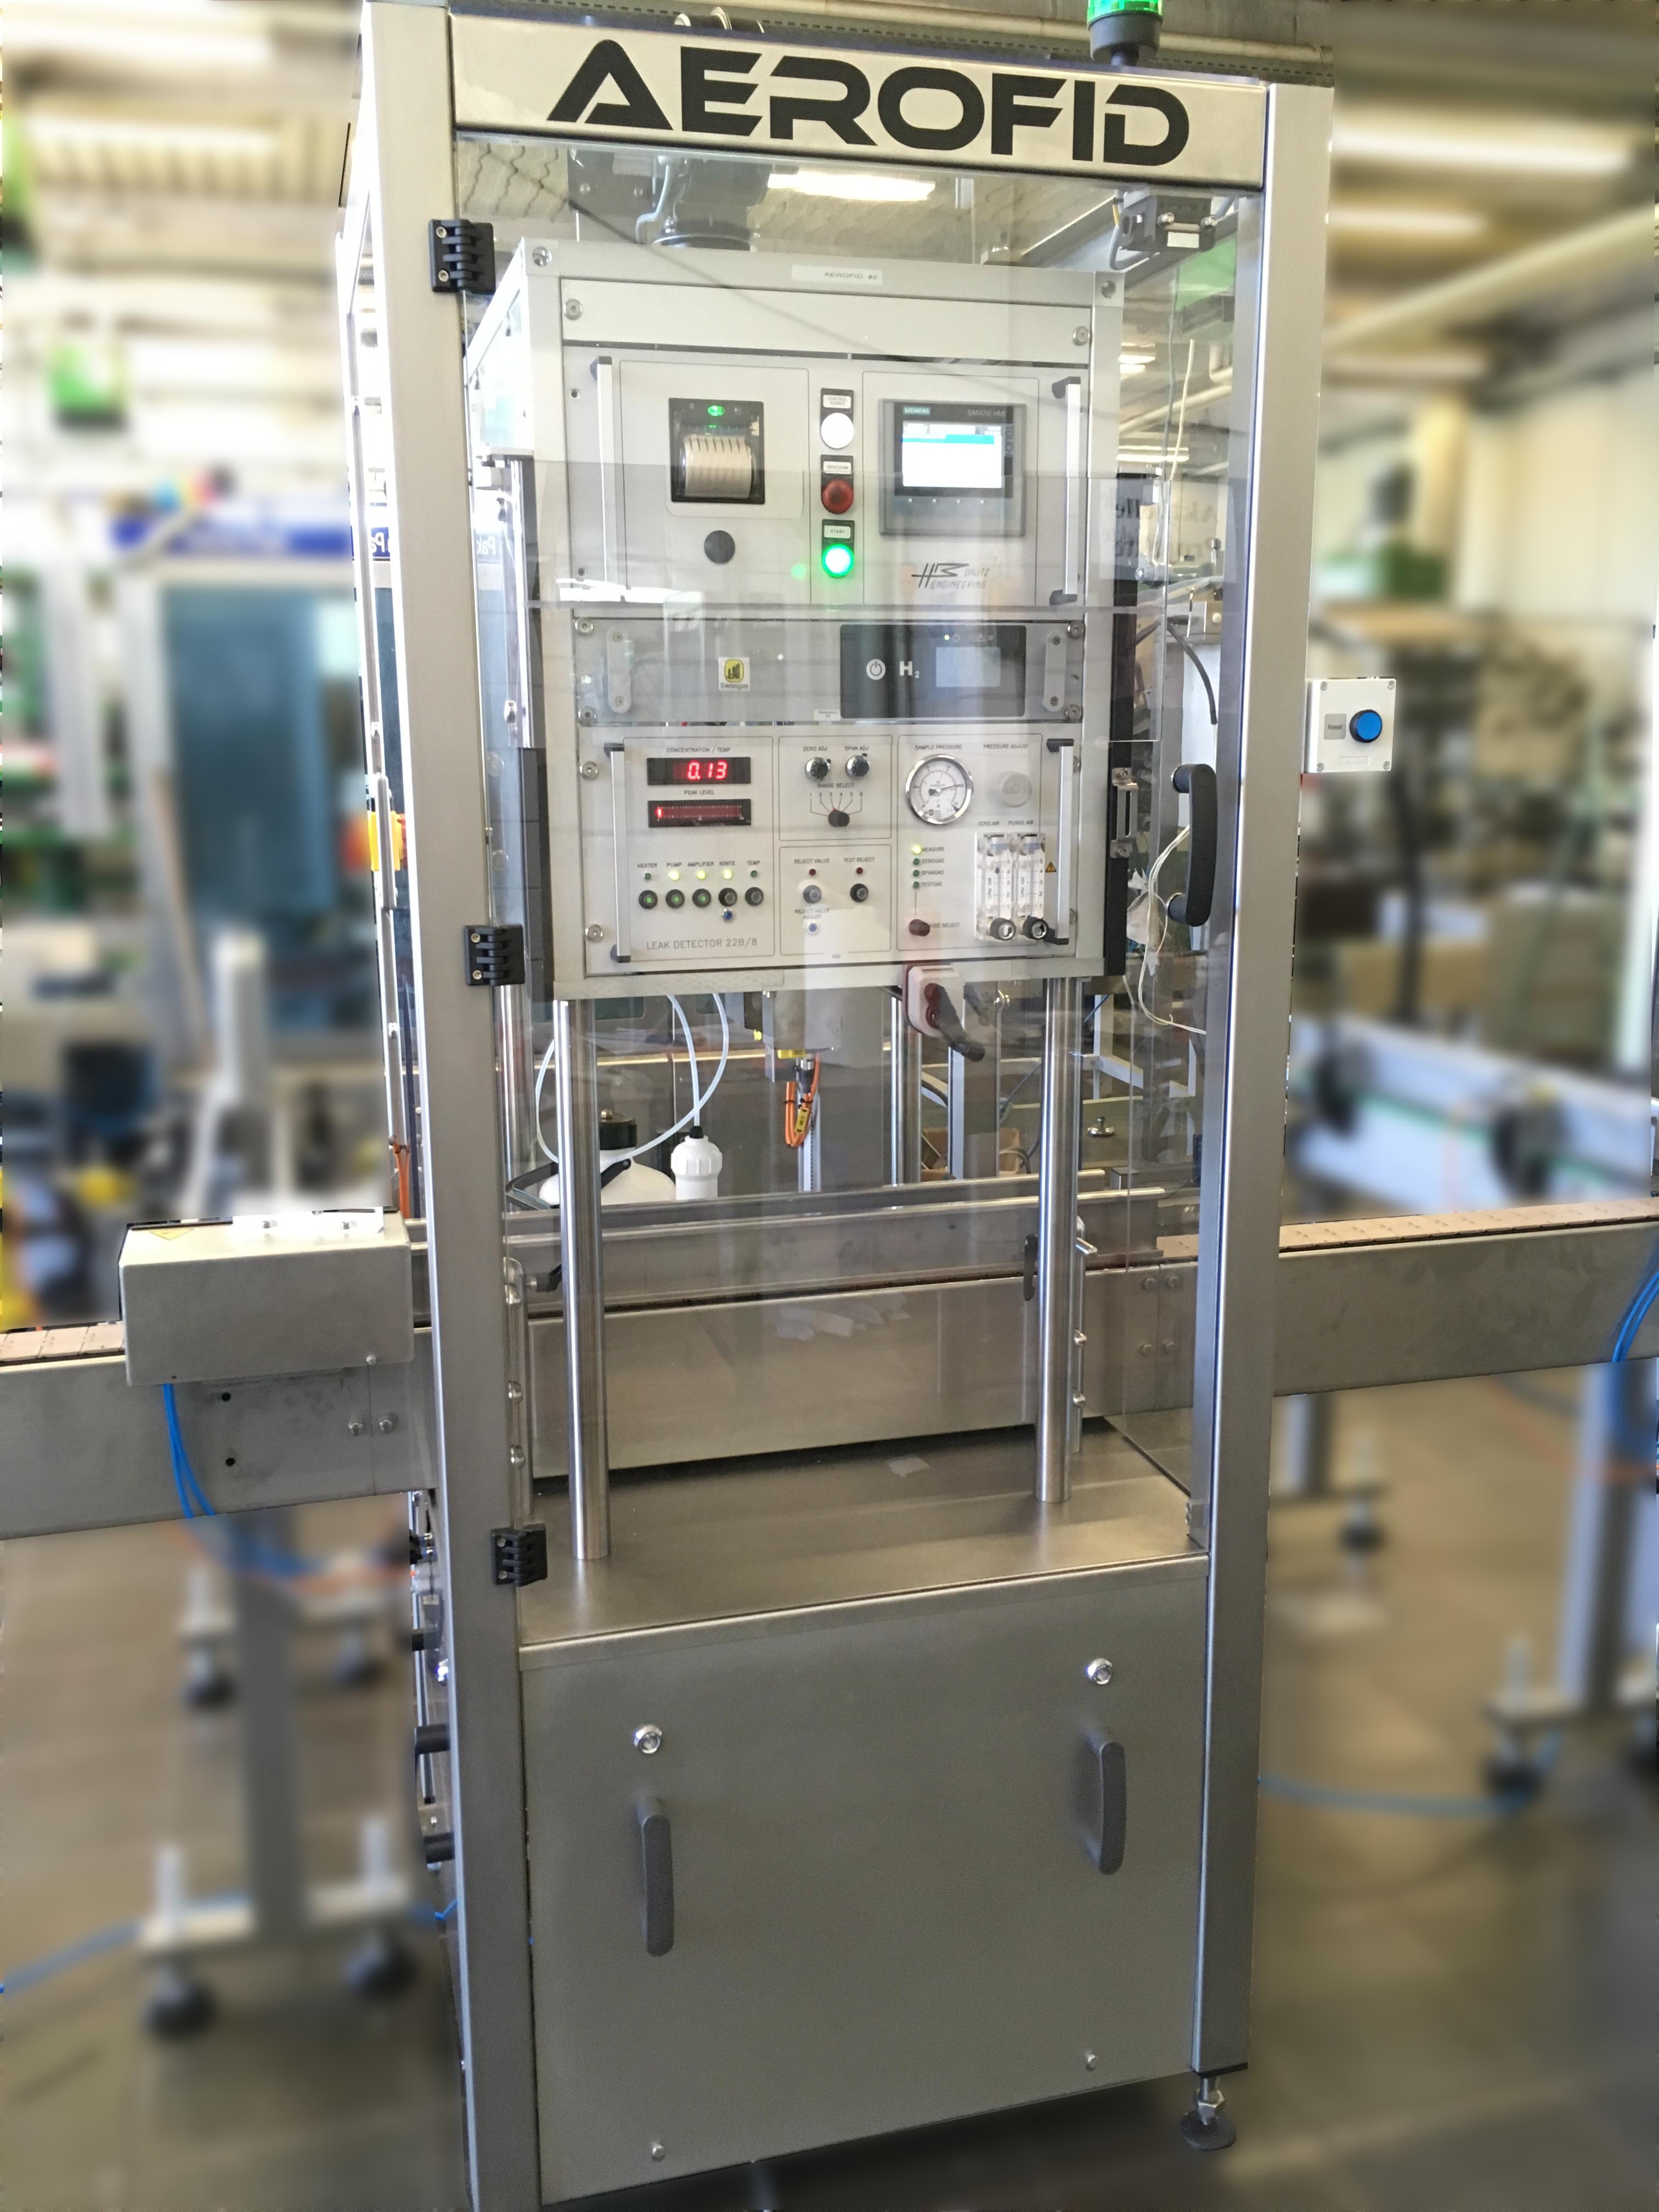 Aerofid Aerosol Leak Detector Raupack UK and Ireland